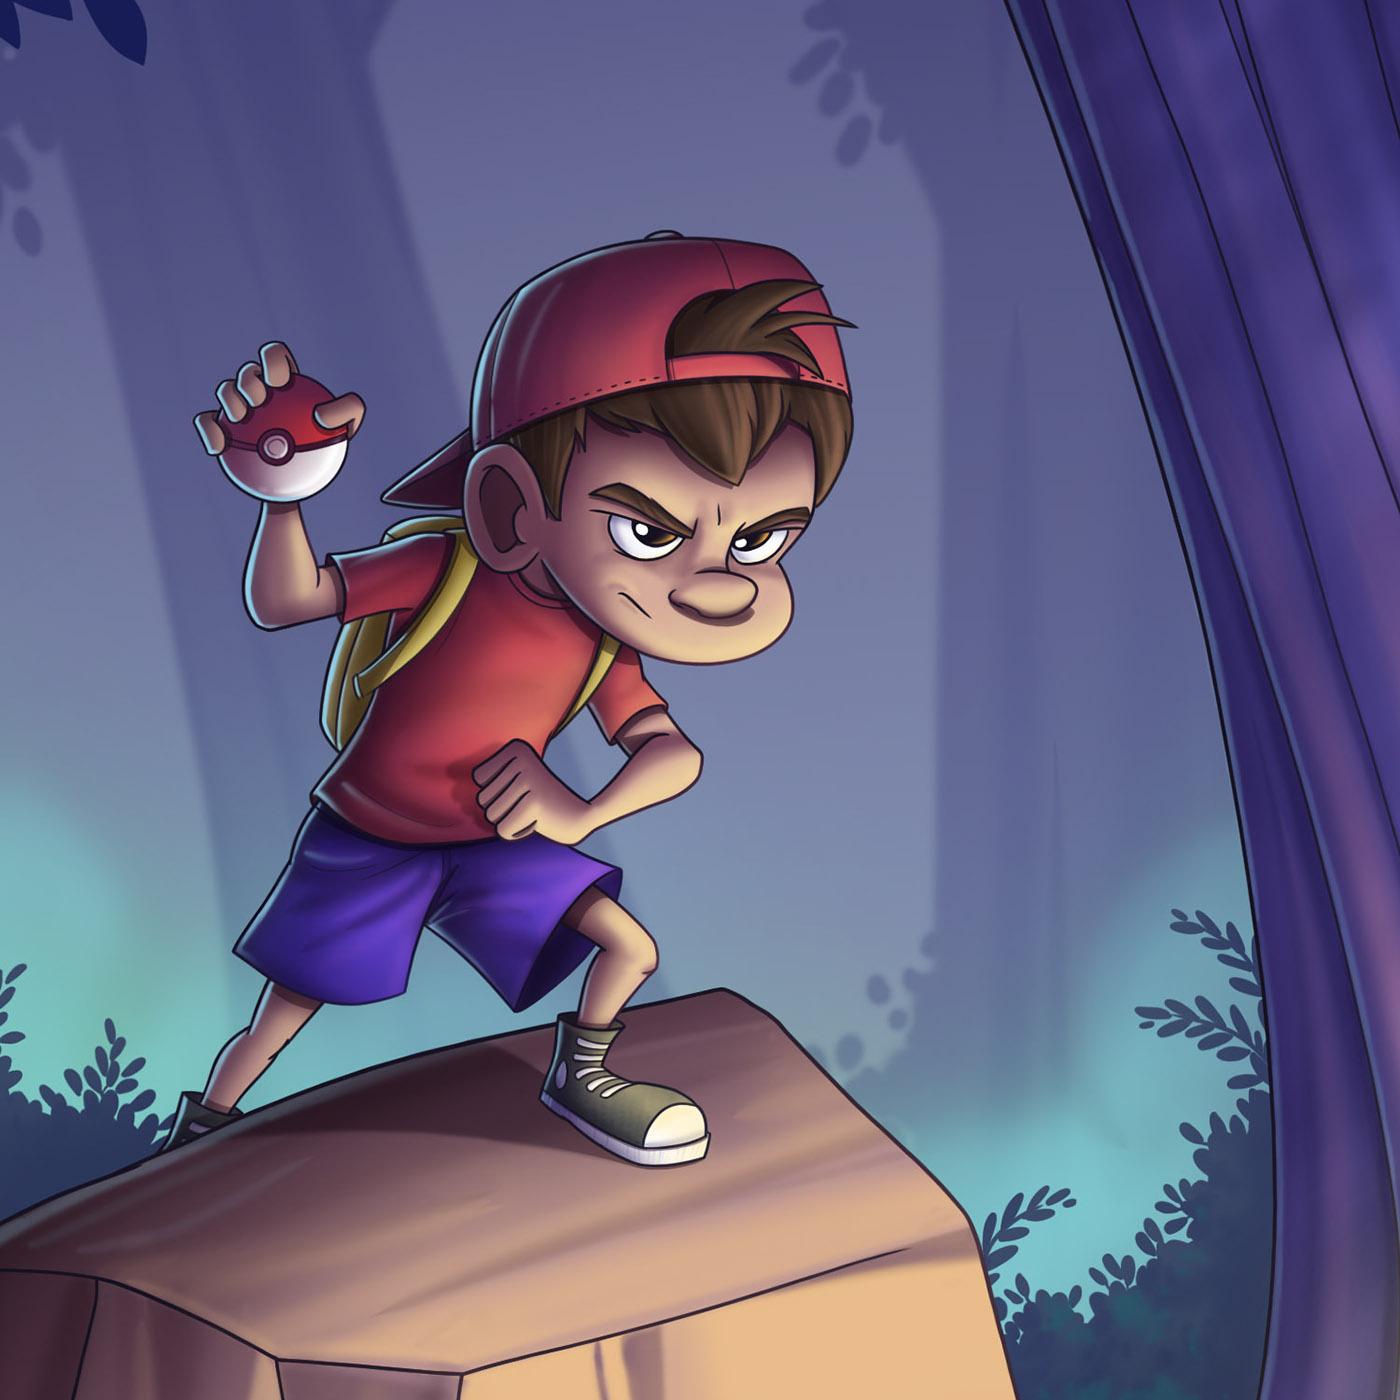 Pokemon ILLUSTRATION  Fan Art portfolio Character design  Digital Art  Charizard cave quest Game Art